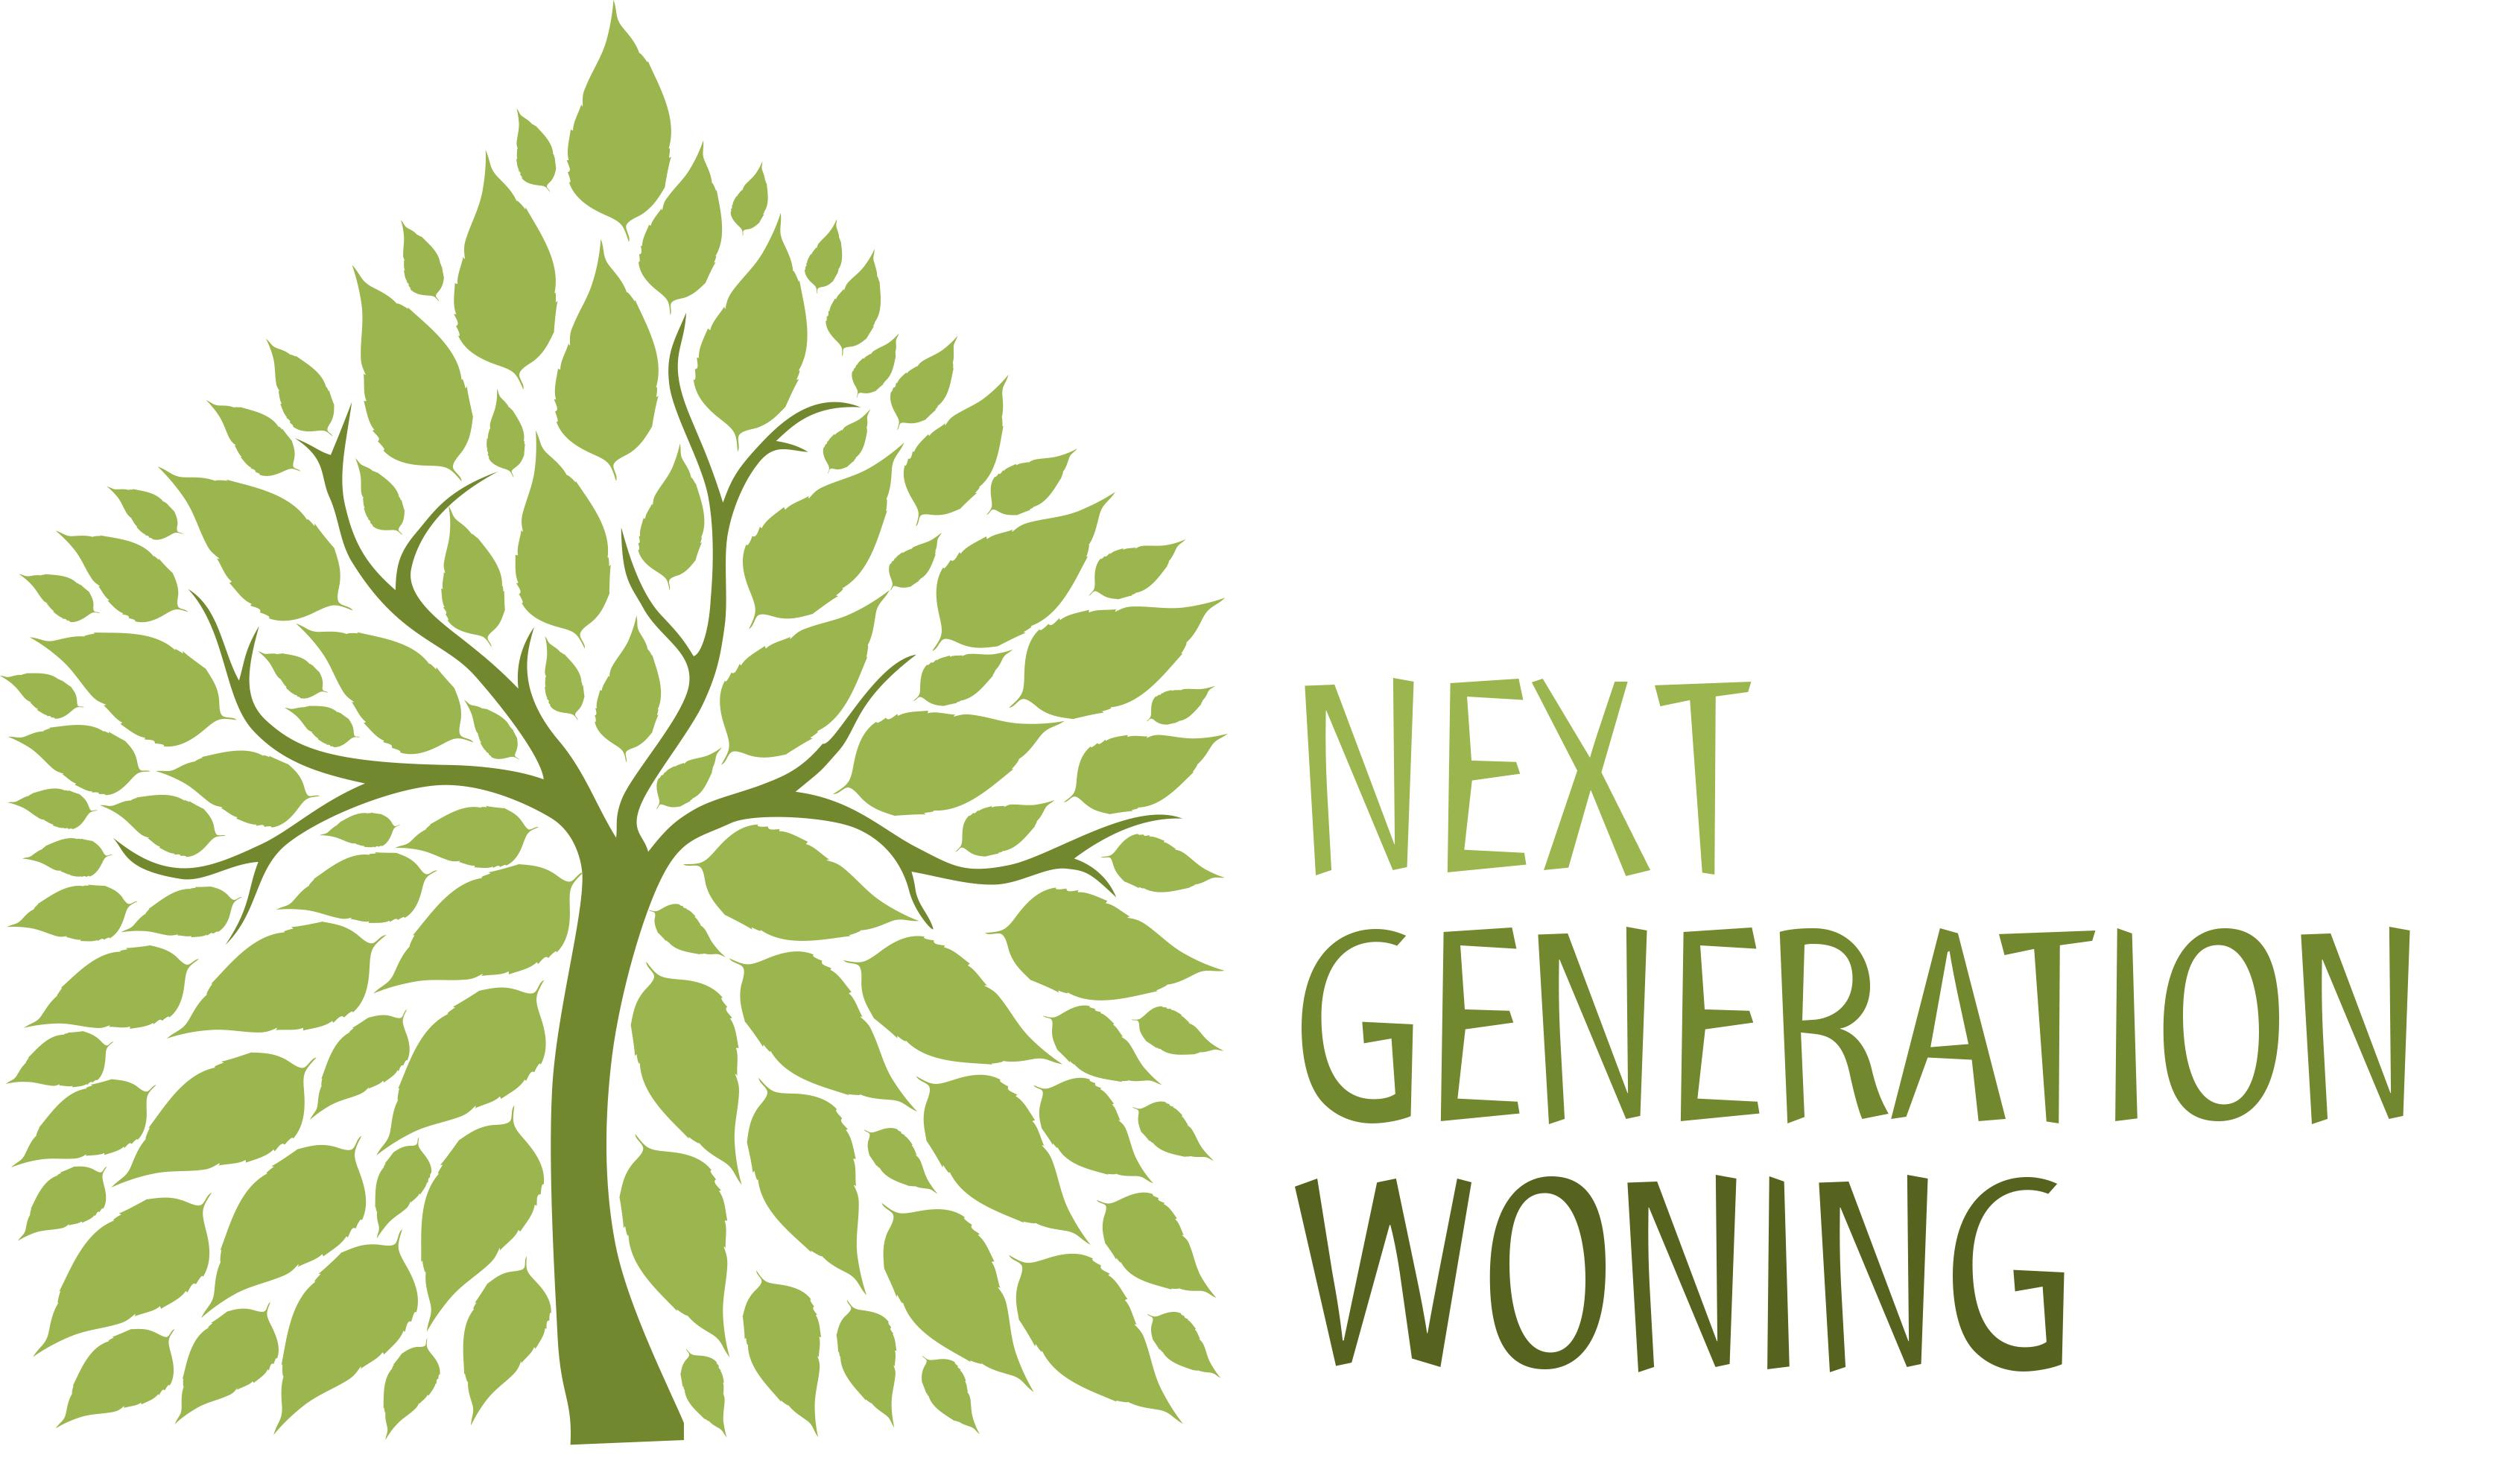 Next Generation Woning